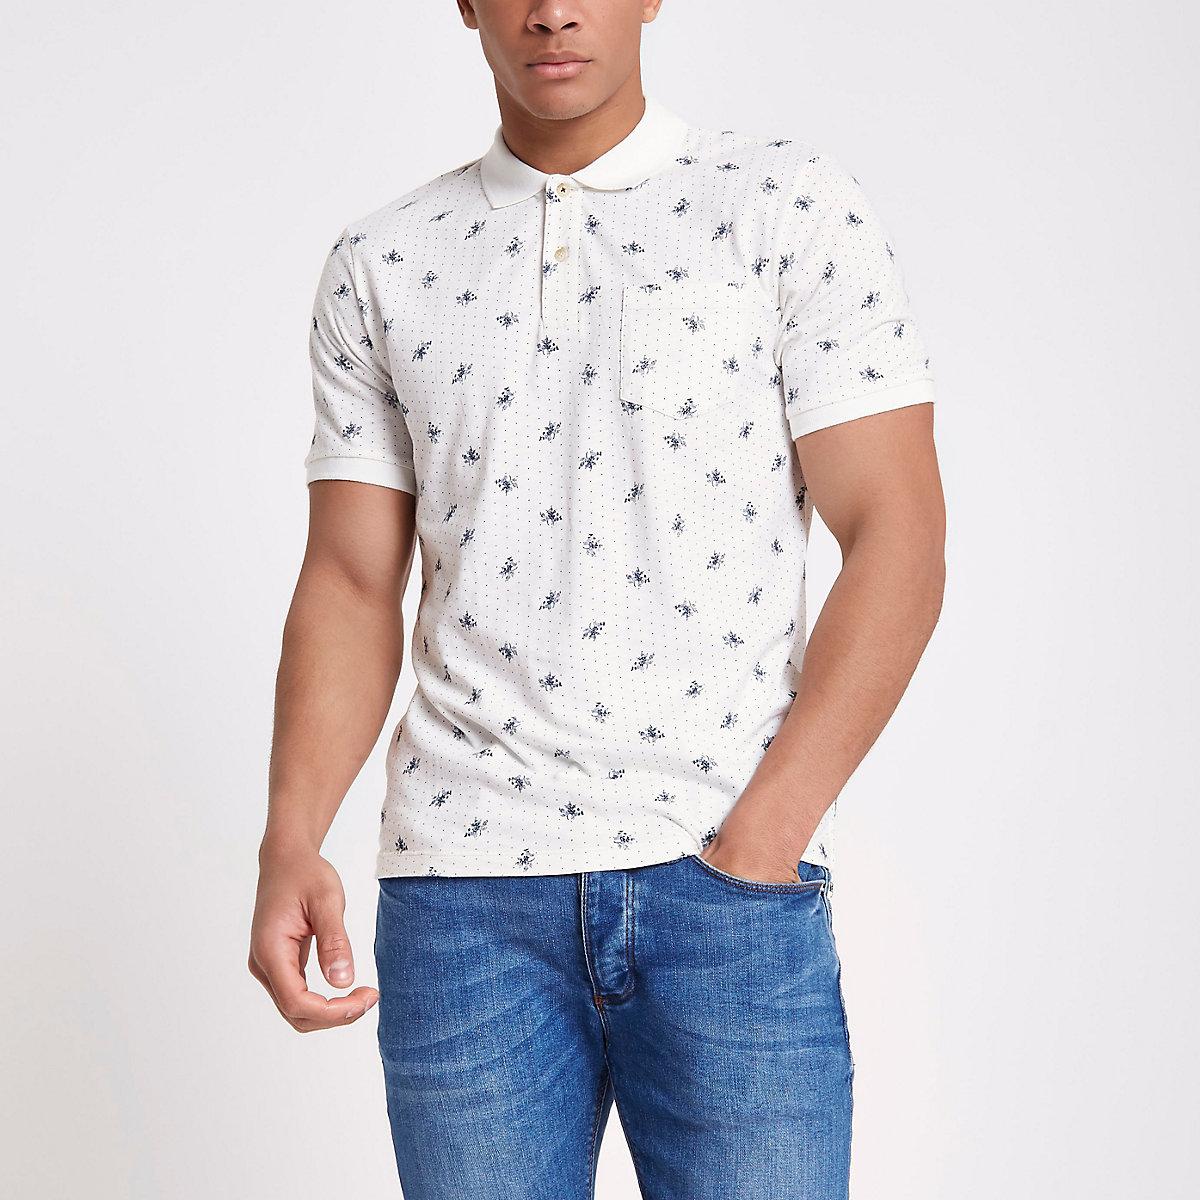 Jack & Jones white floral print polo shirt